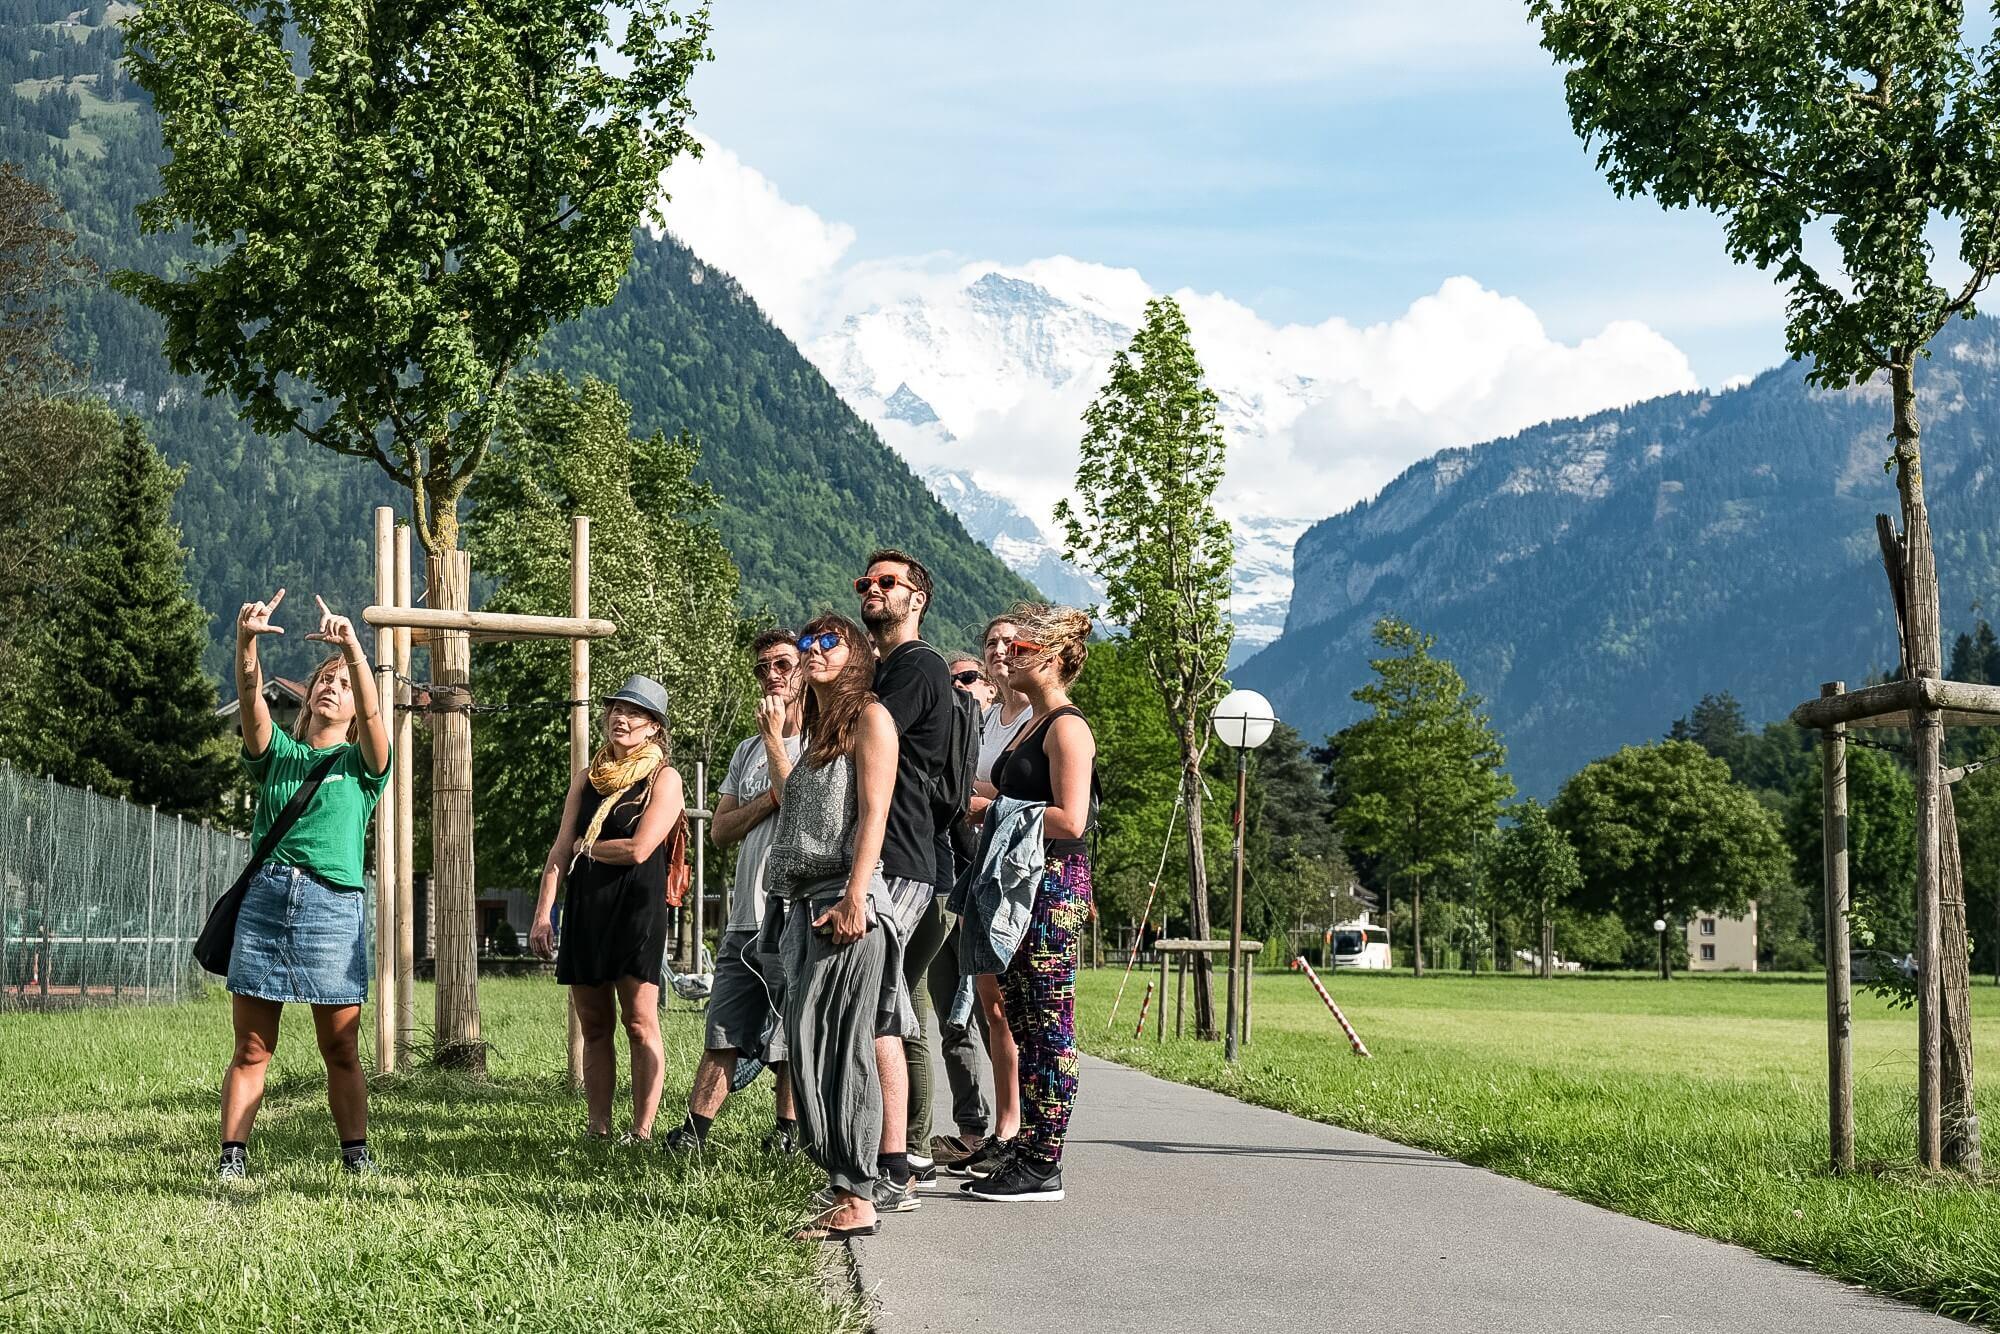 interlaken-walking-tours-h-hematte-sommer